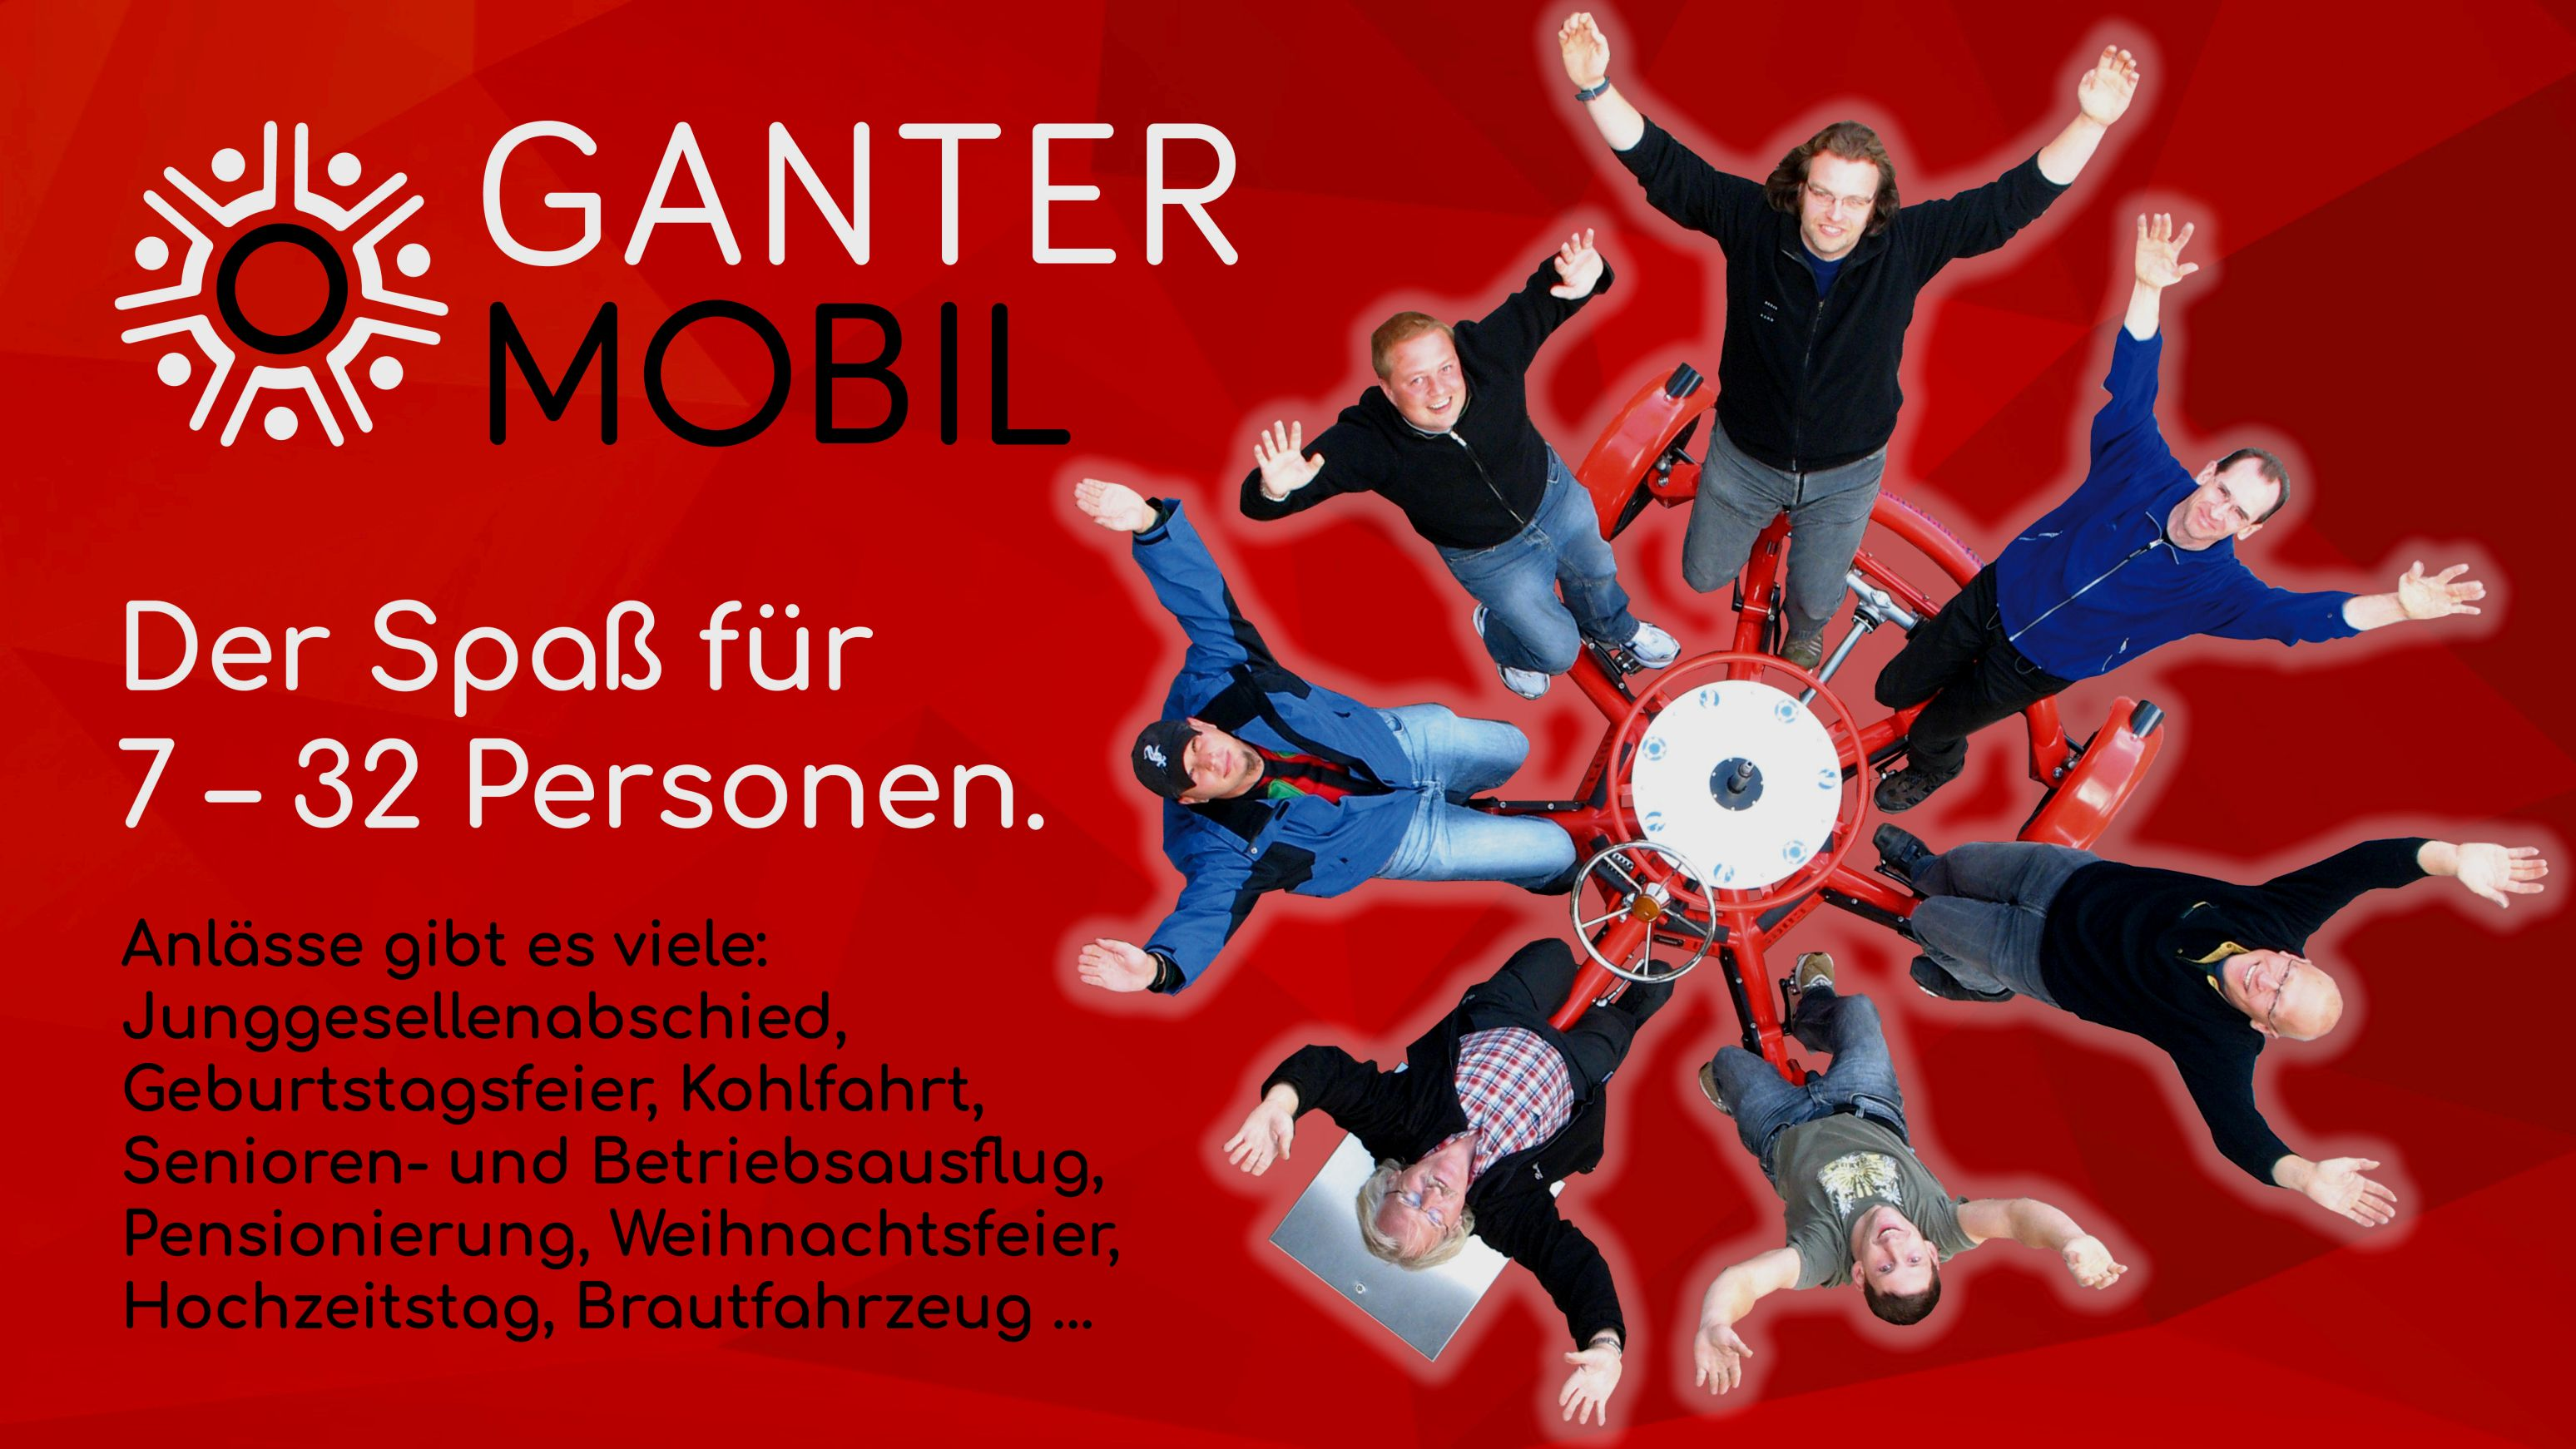 GanterMobil